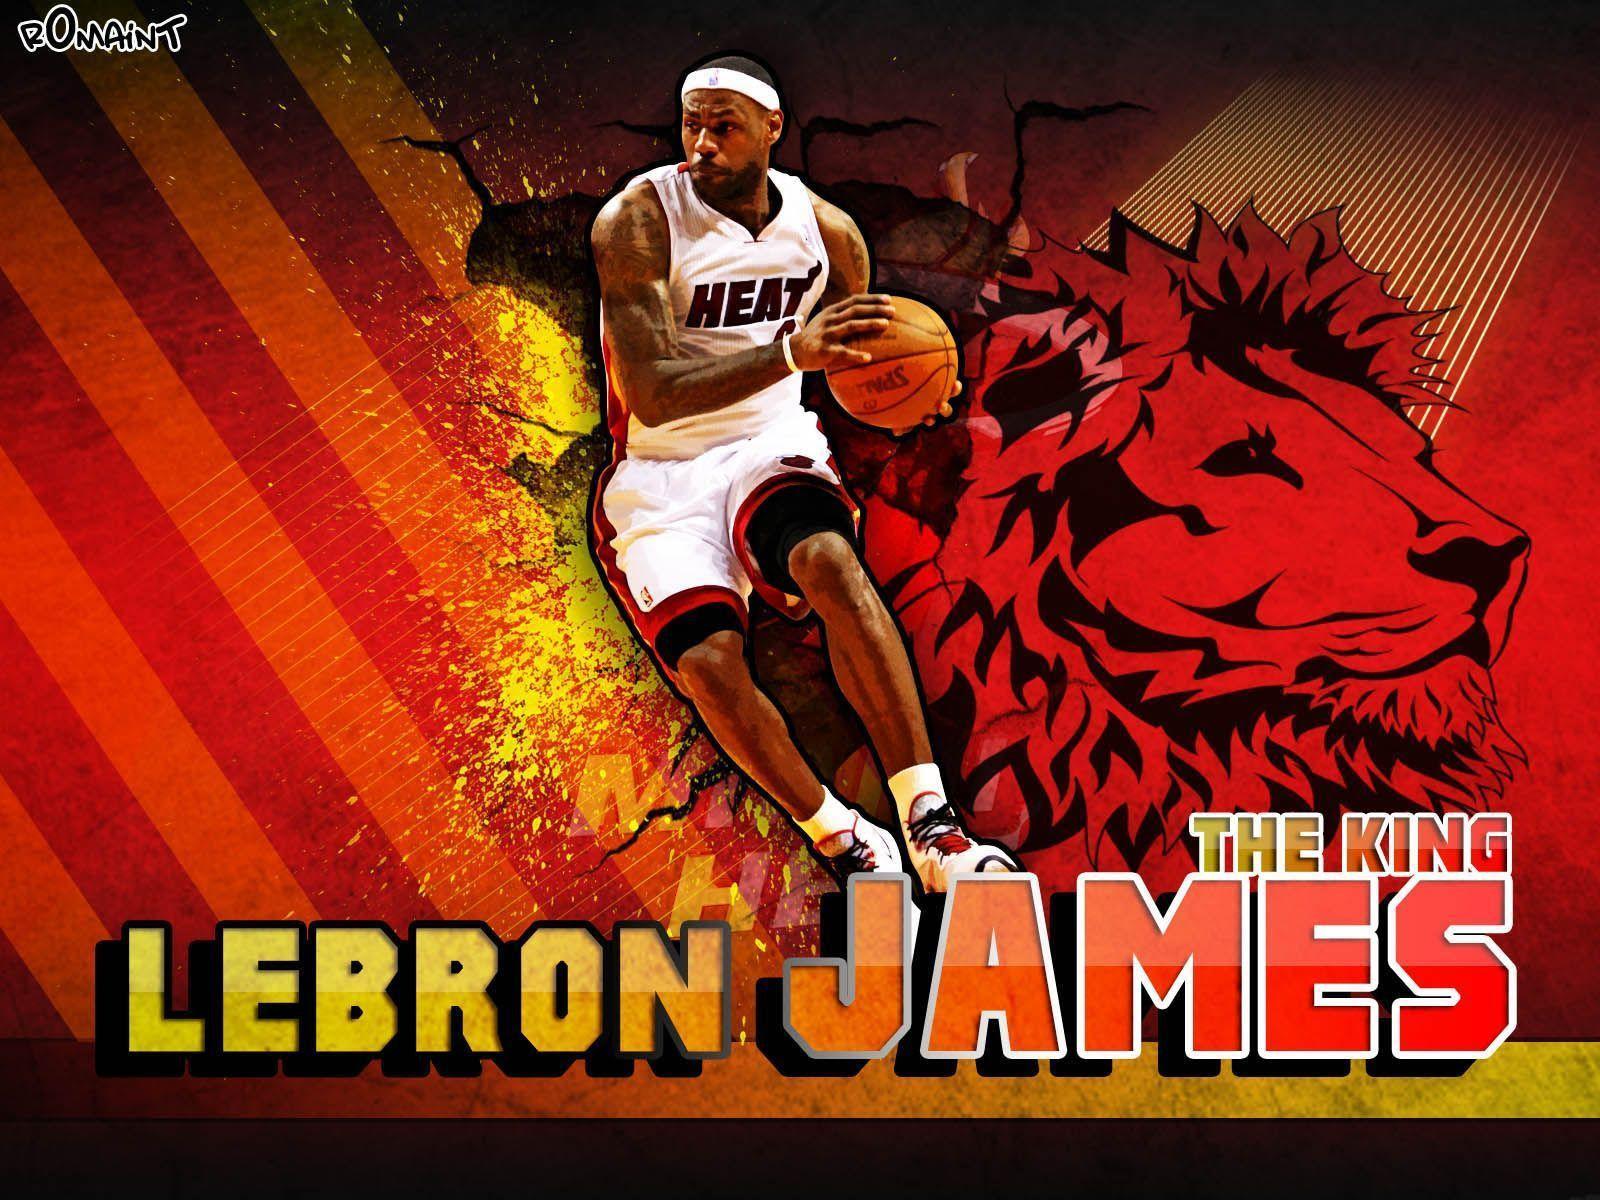 Lebron James Wallpapers Miami Heat - Wallpaper Cave